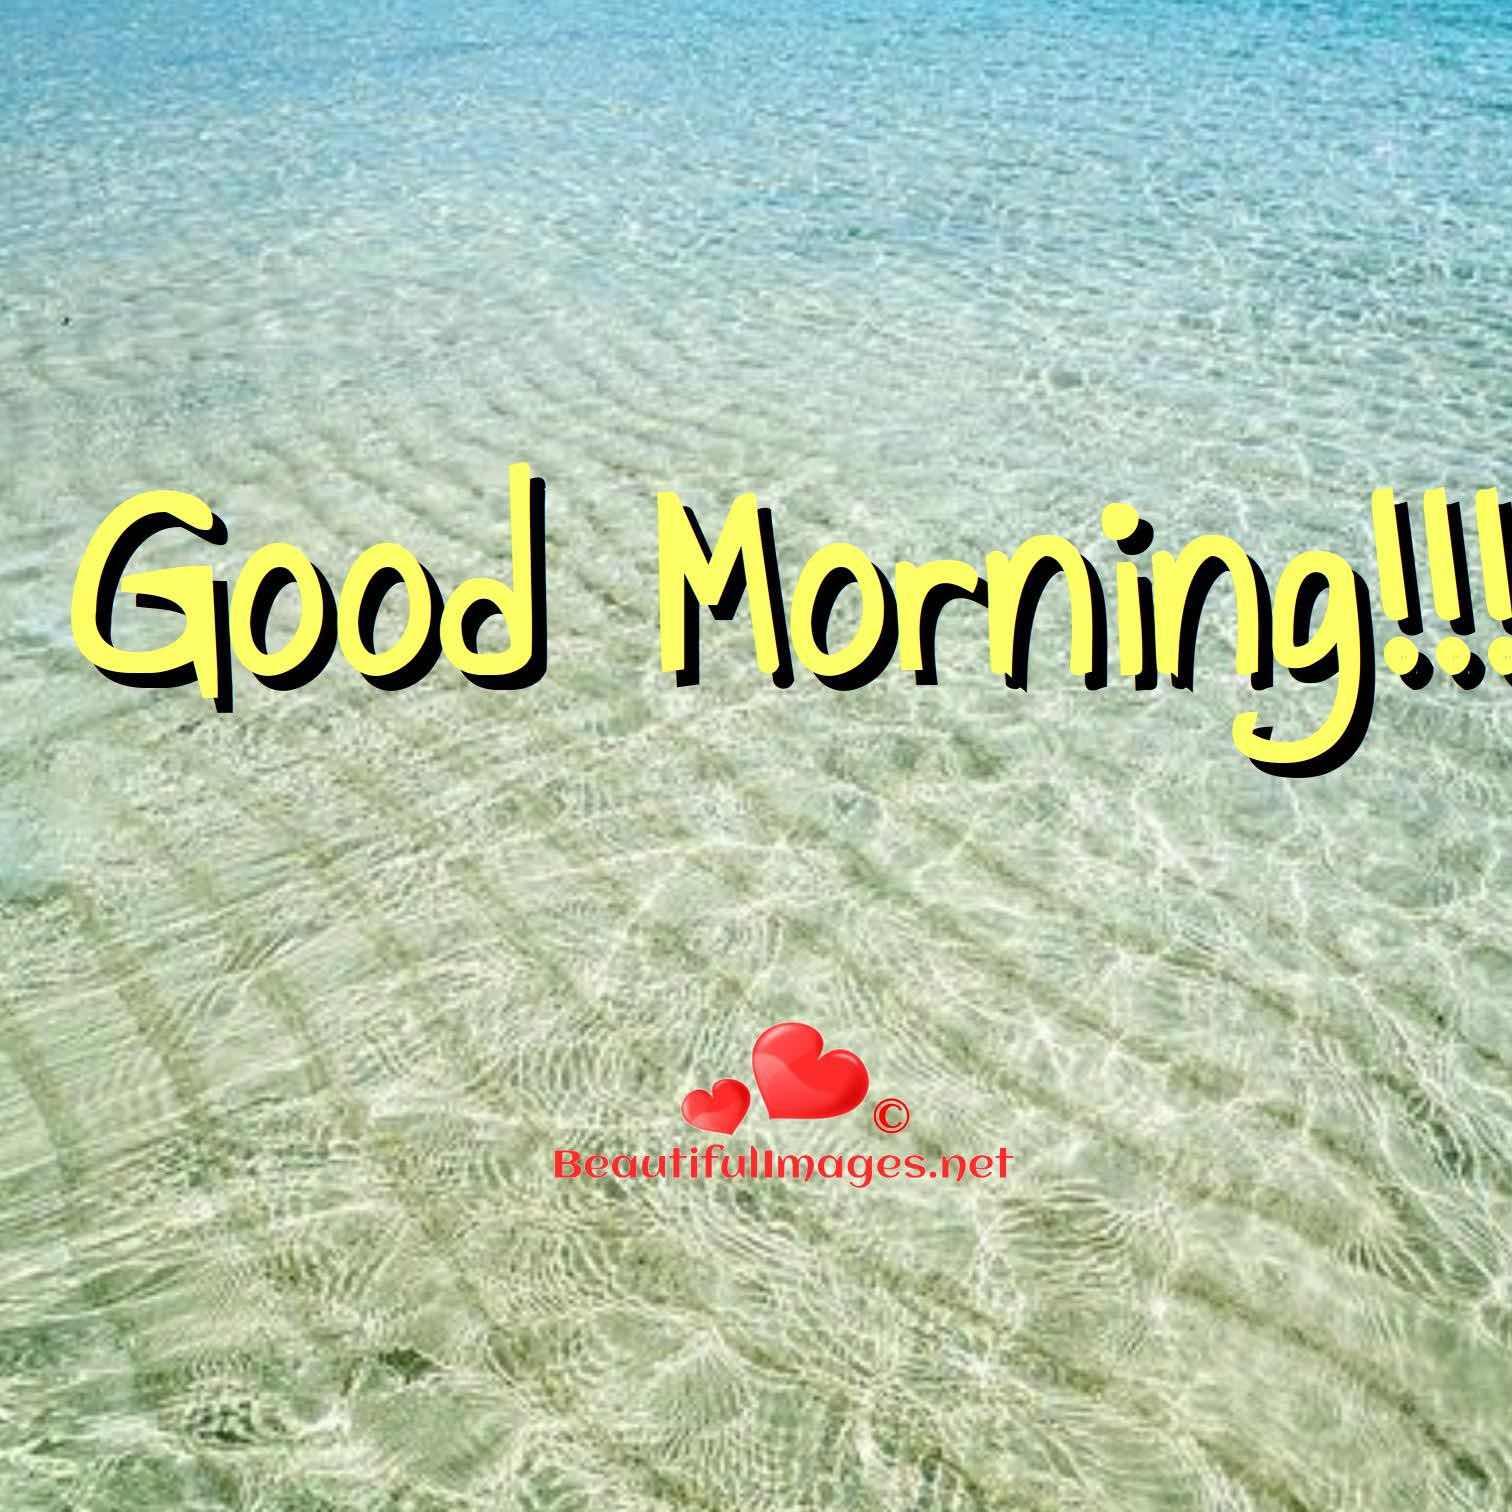 Good-Morning-Facebook-Whatsapp-Instagram-Beach